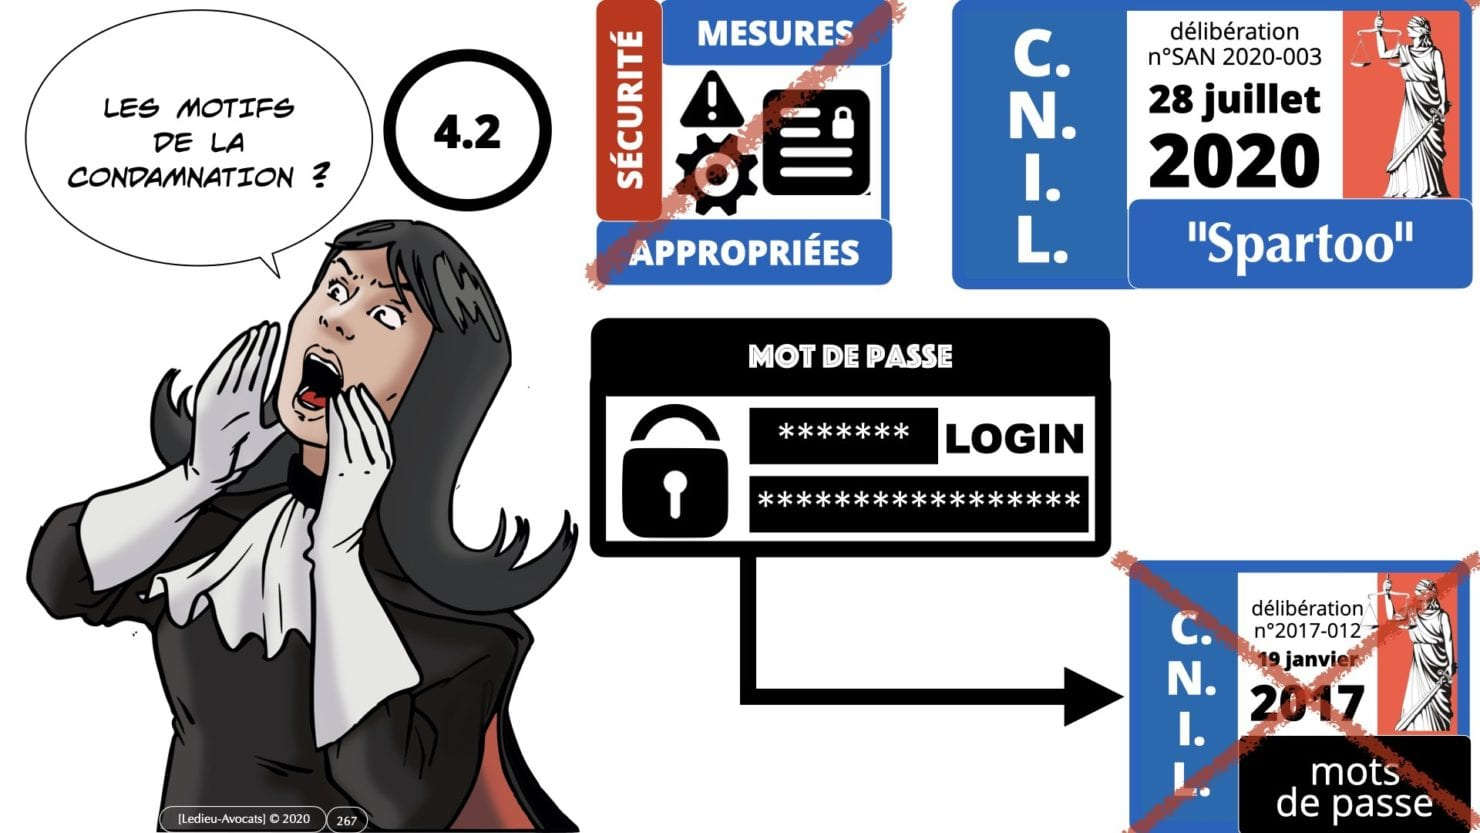 RGPD e-Privacy principes actualité jurisprudence ©Ledieu-Avocats 25-06-2021.267